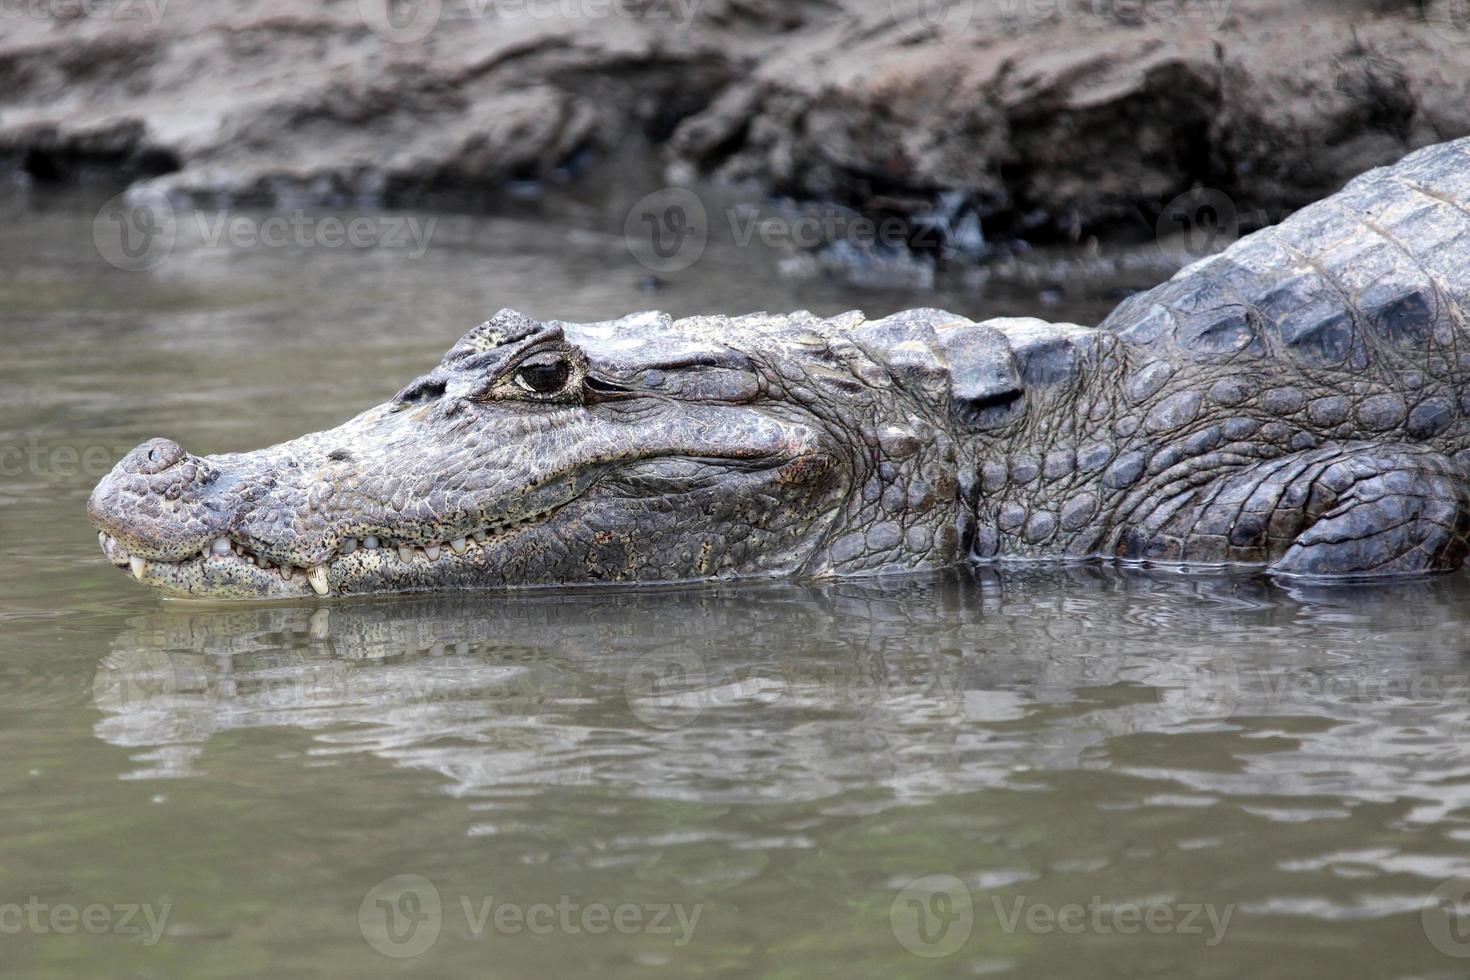 Cayman in Costa Rica. Kopf einer Krokodil-Nahaufnahme. кайман foto